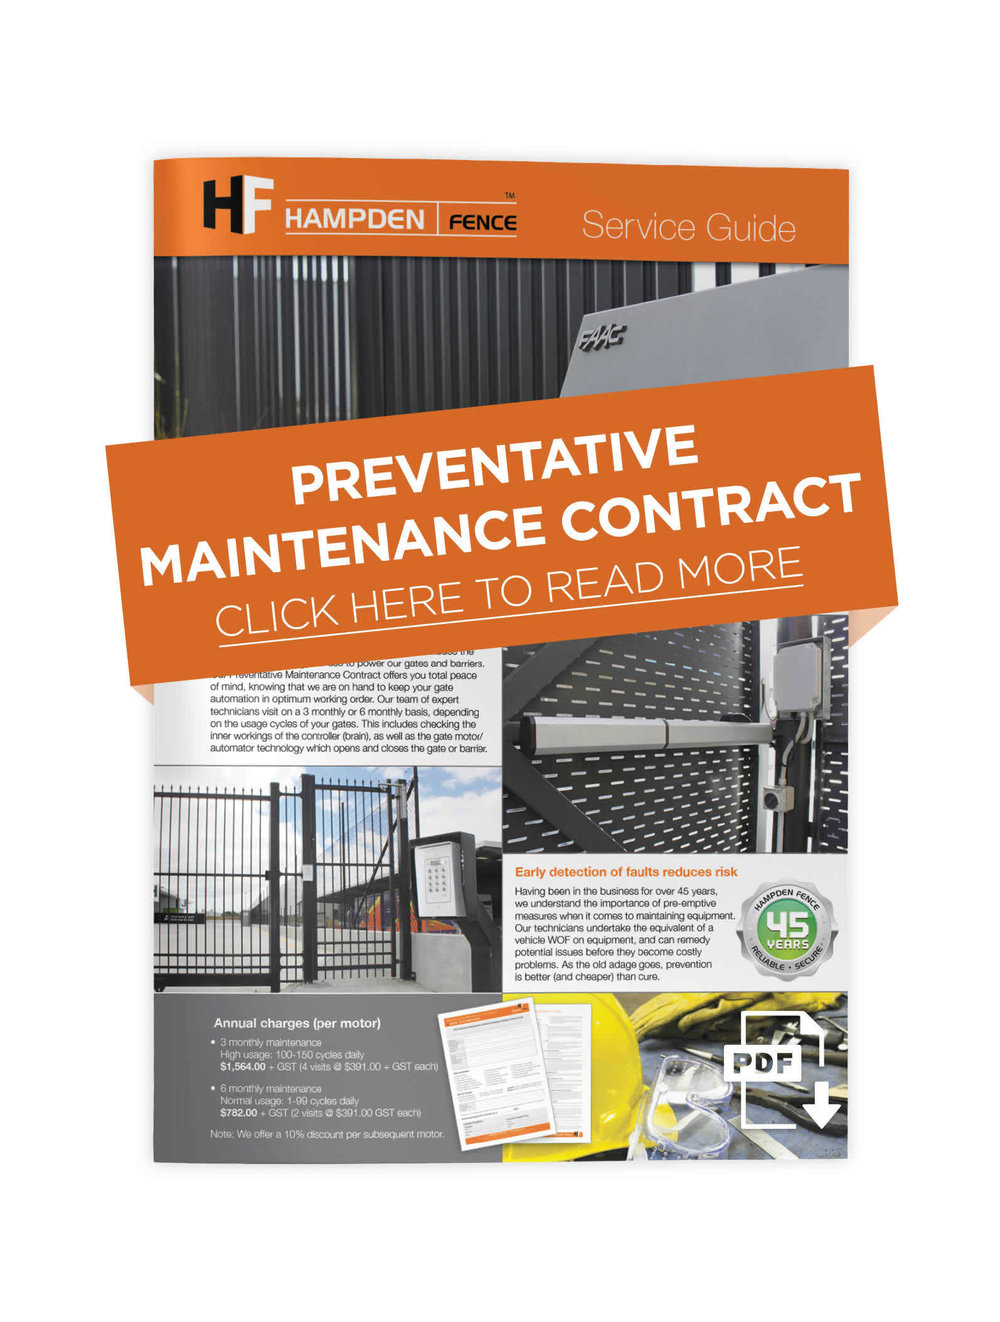 HAM_002672 Preventative maintenance leaflet icon White Background Cropped.jpg